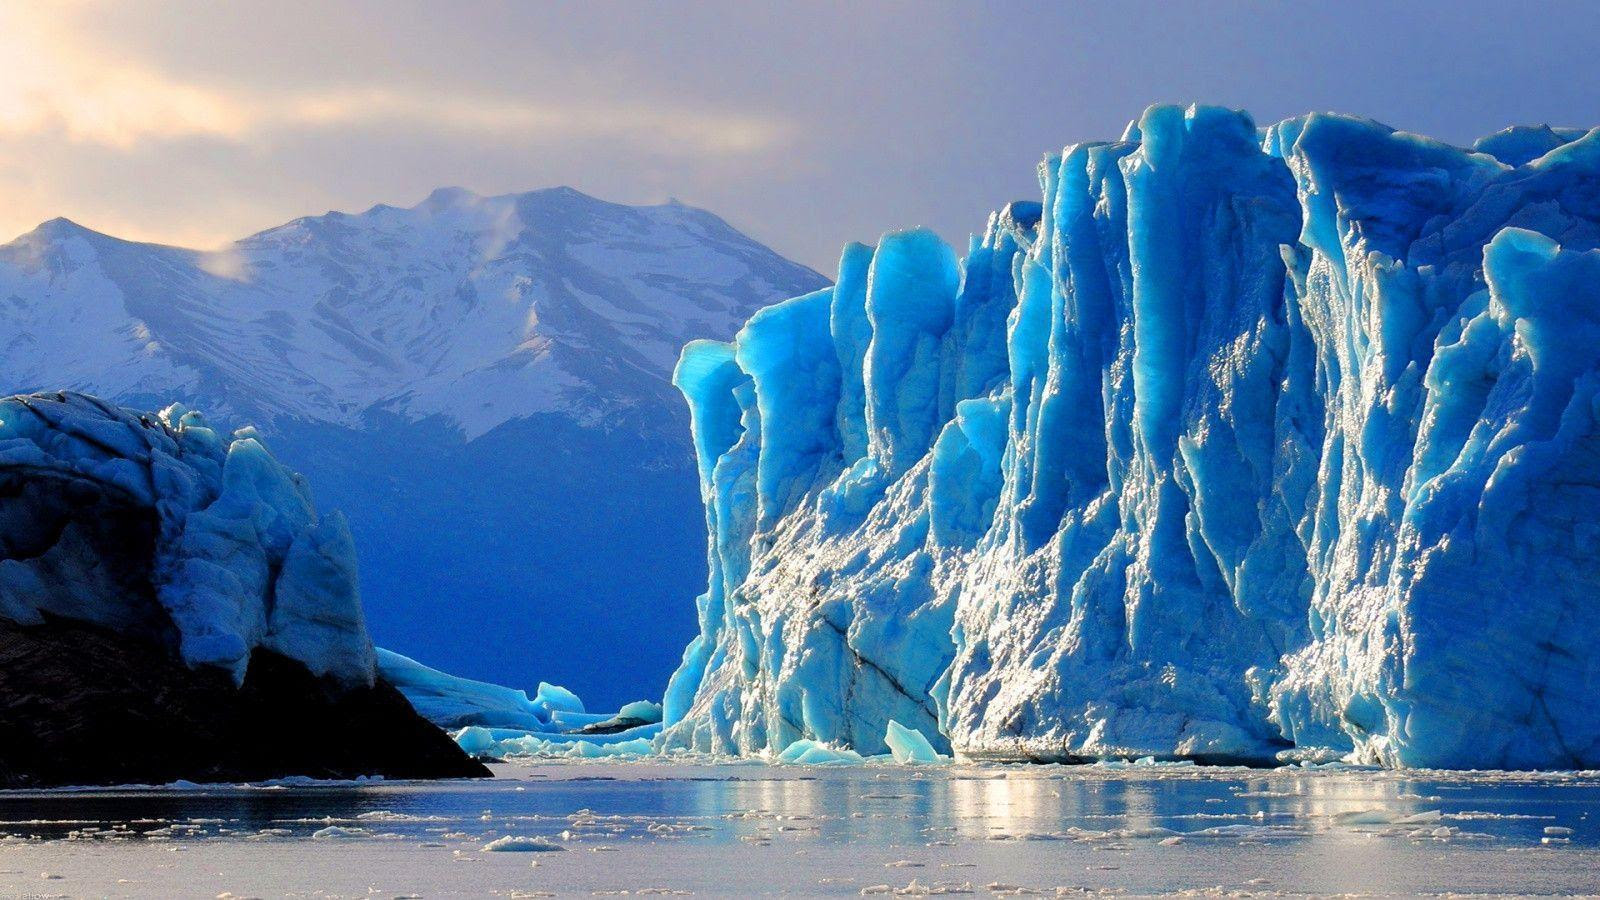 Glacier Wallpapers - Wallpaper Cave